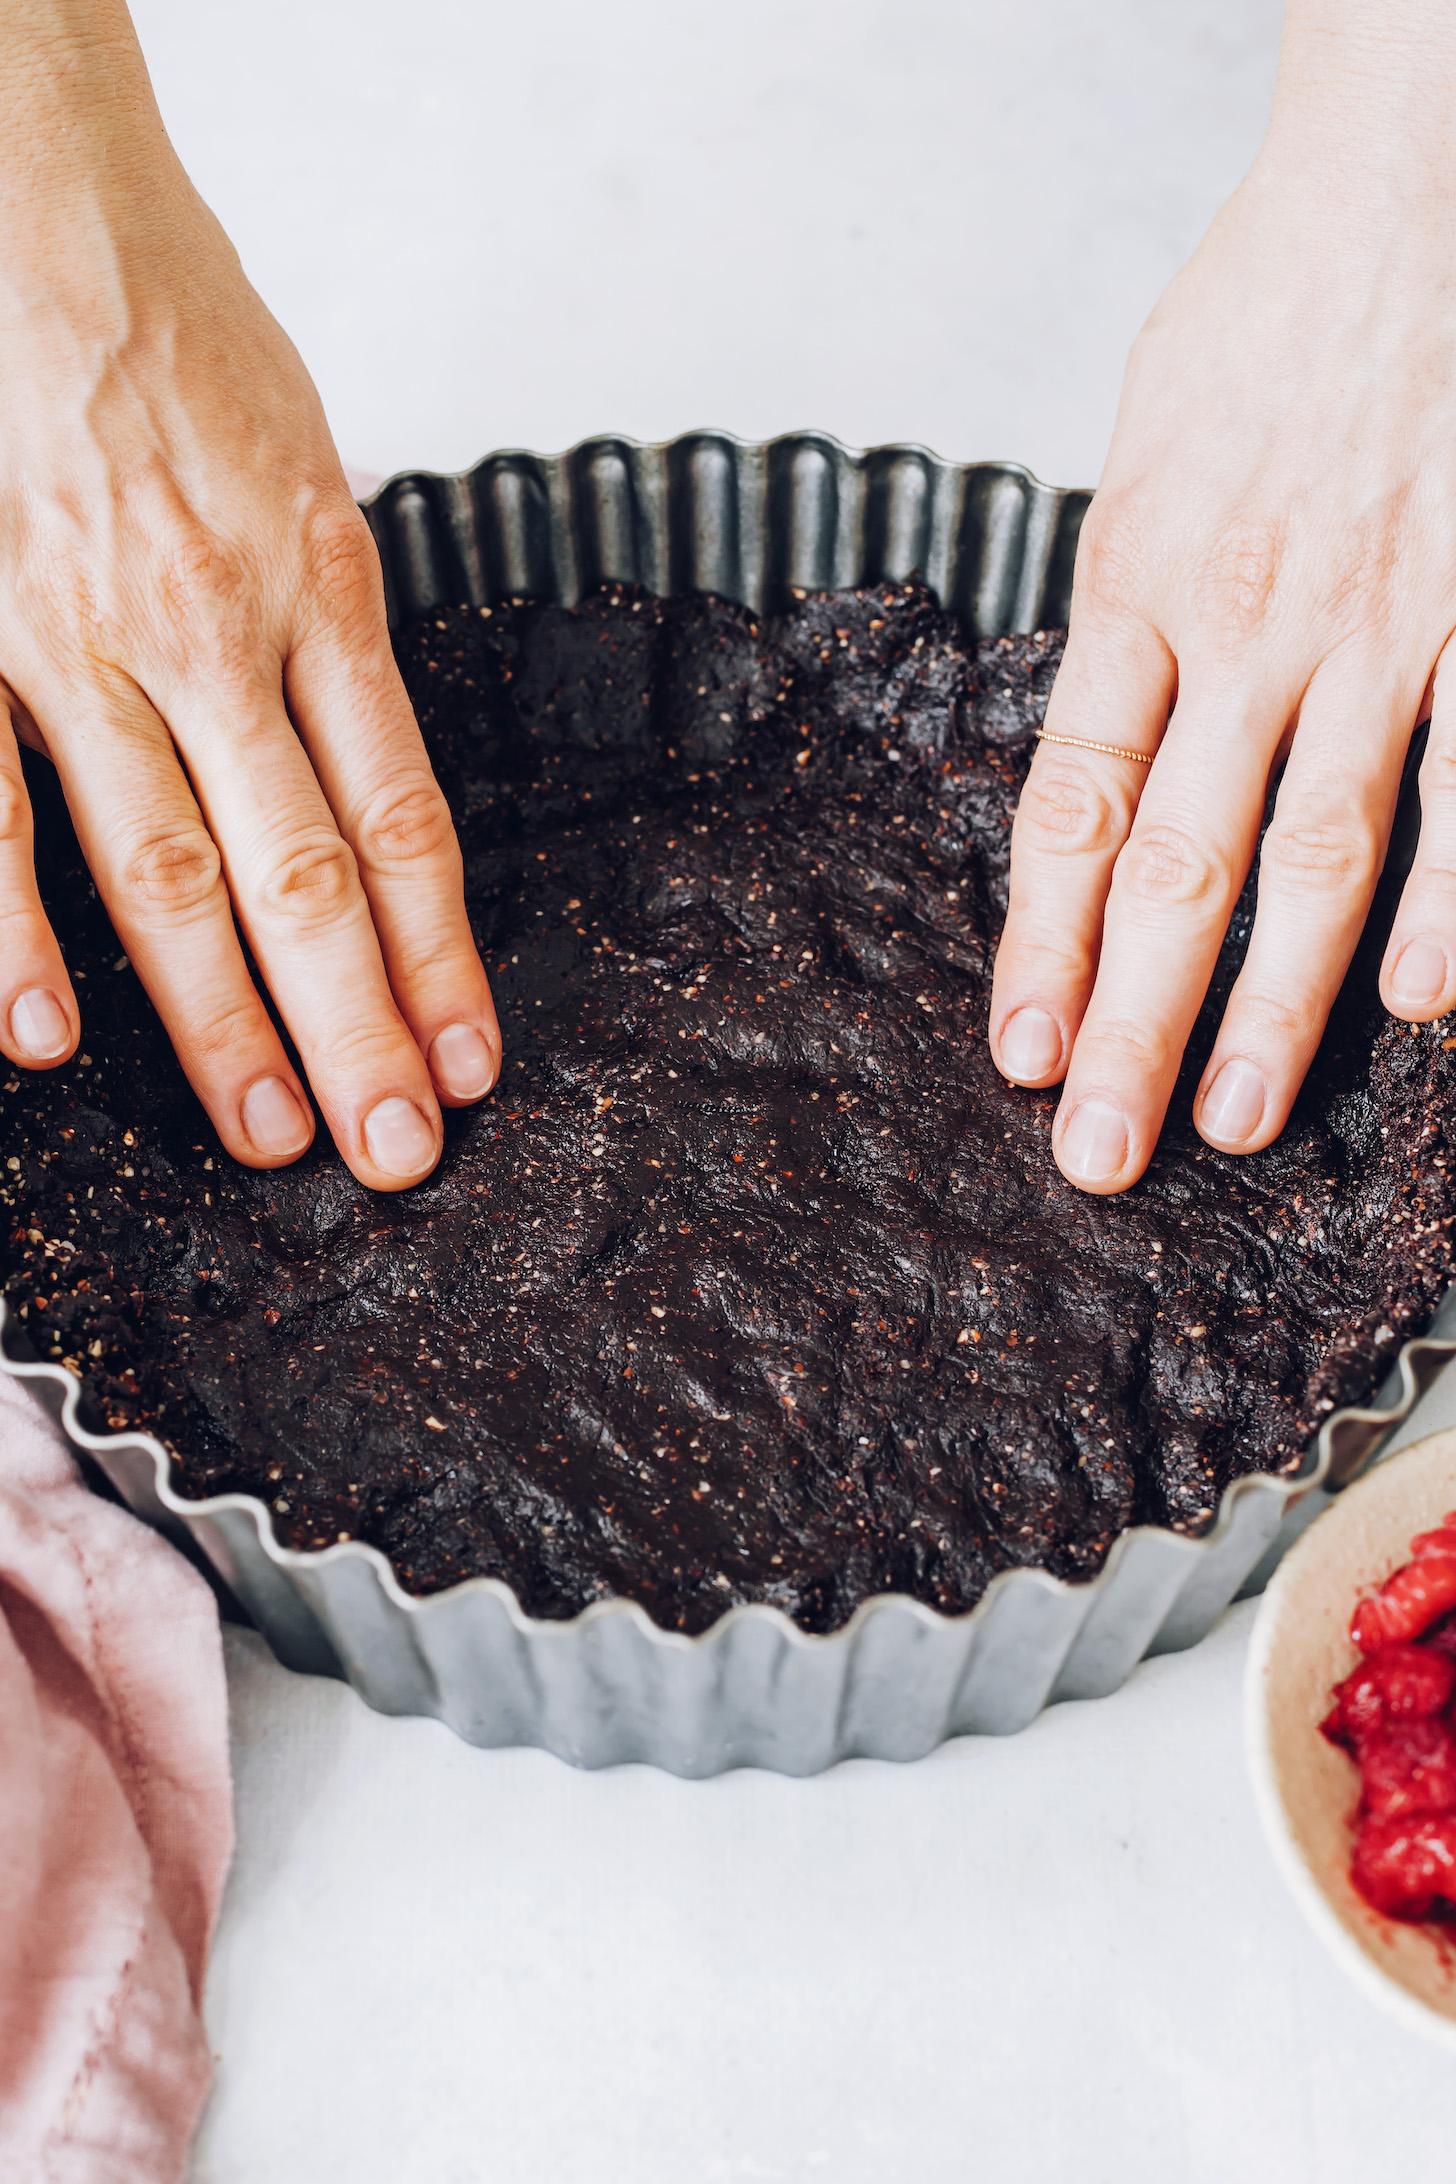 Pressing the dark chocolate date crust into a tart pan